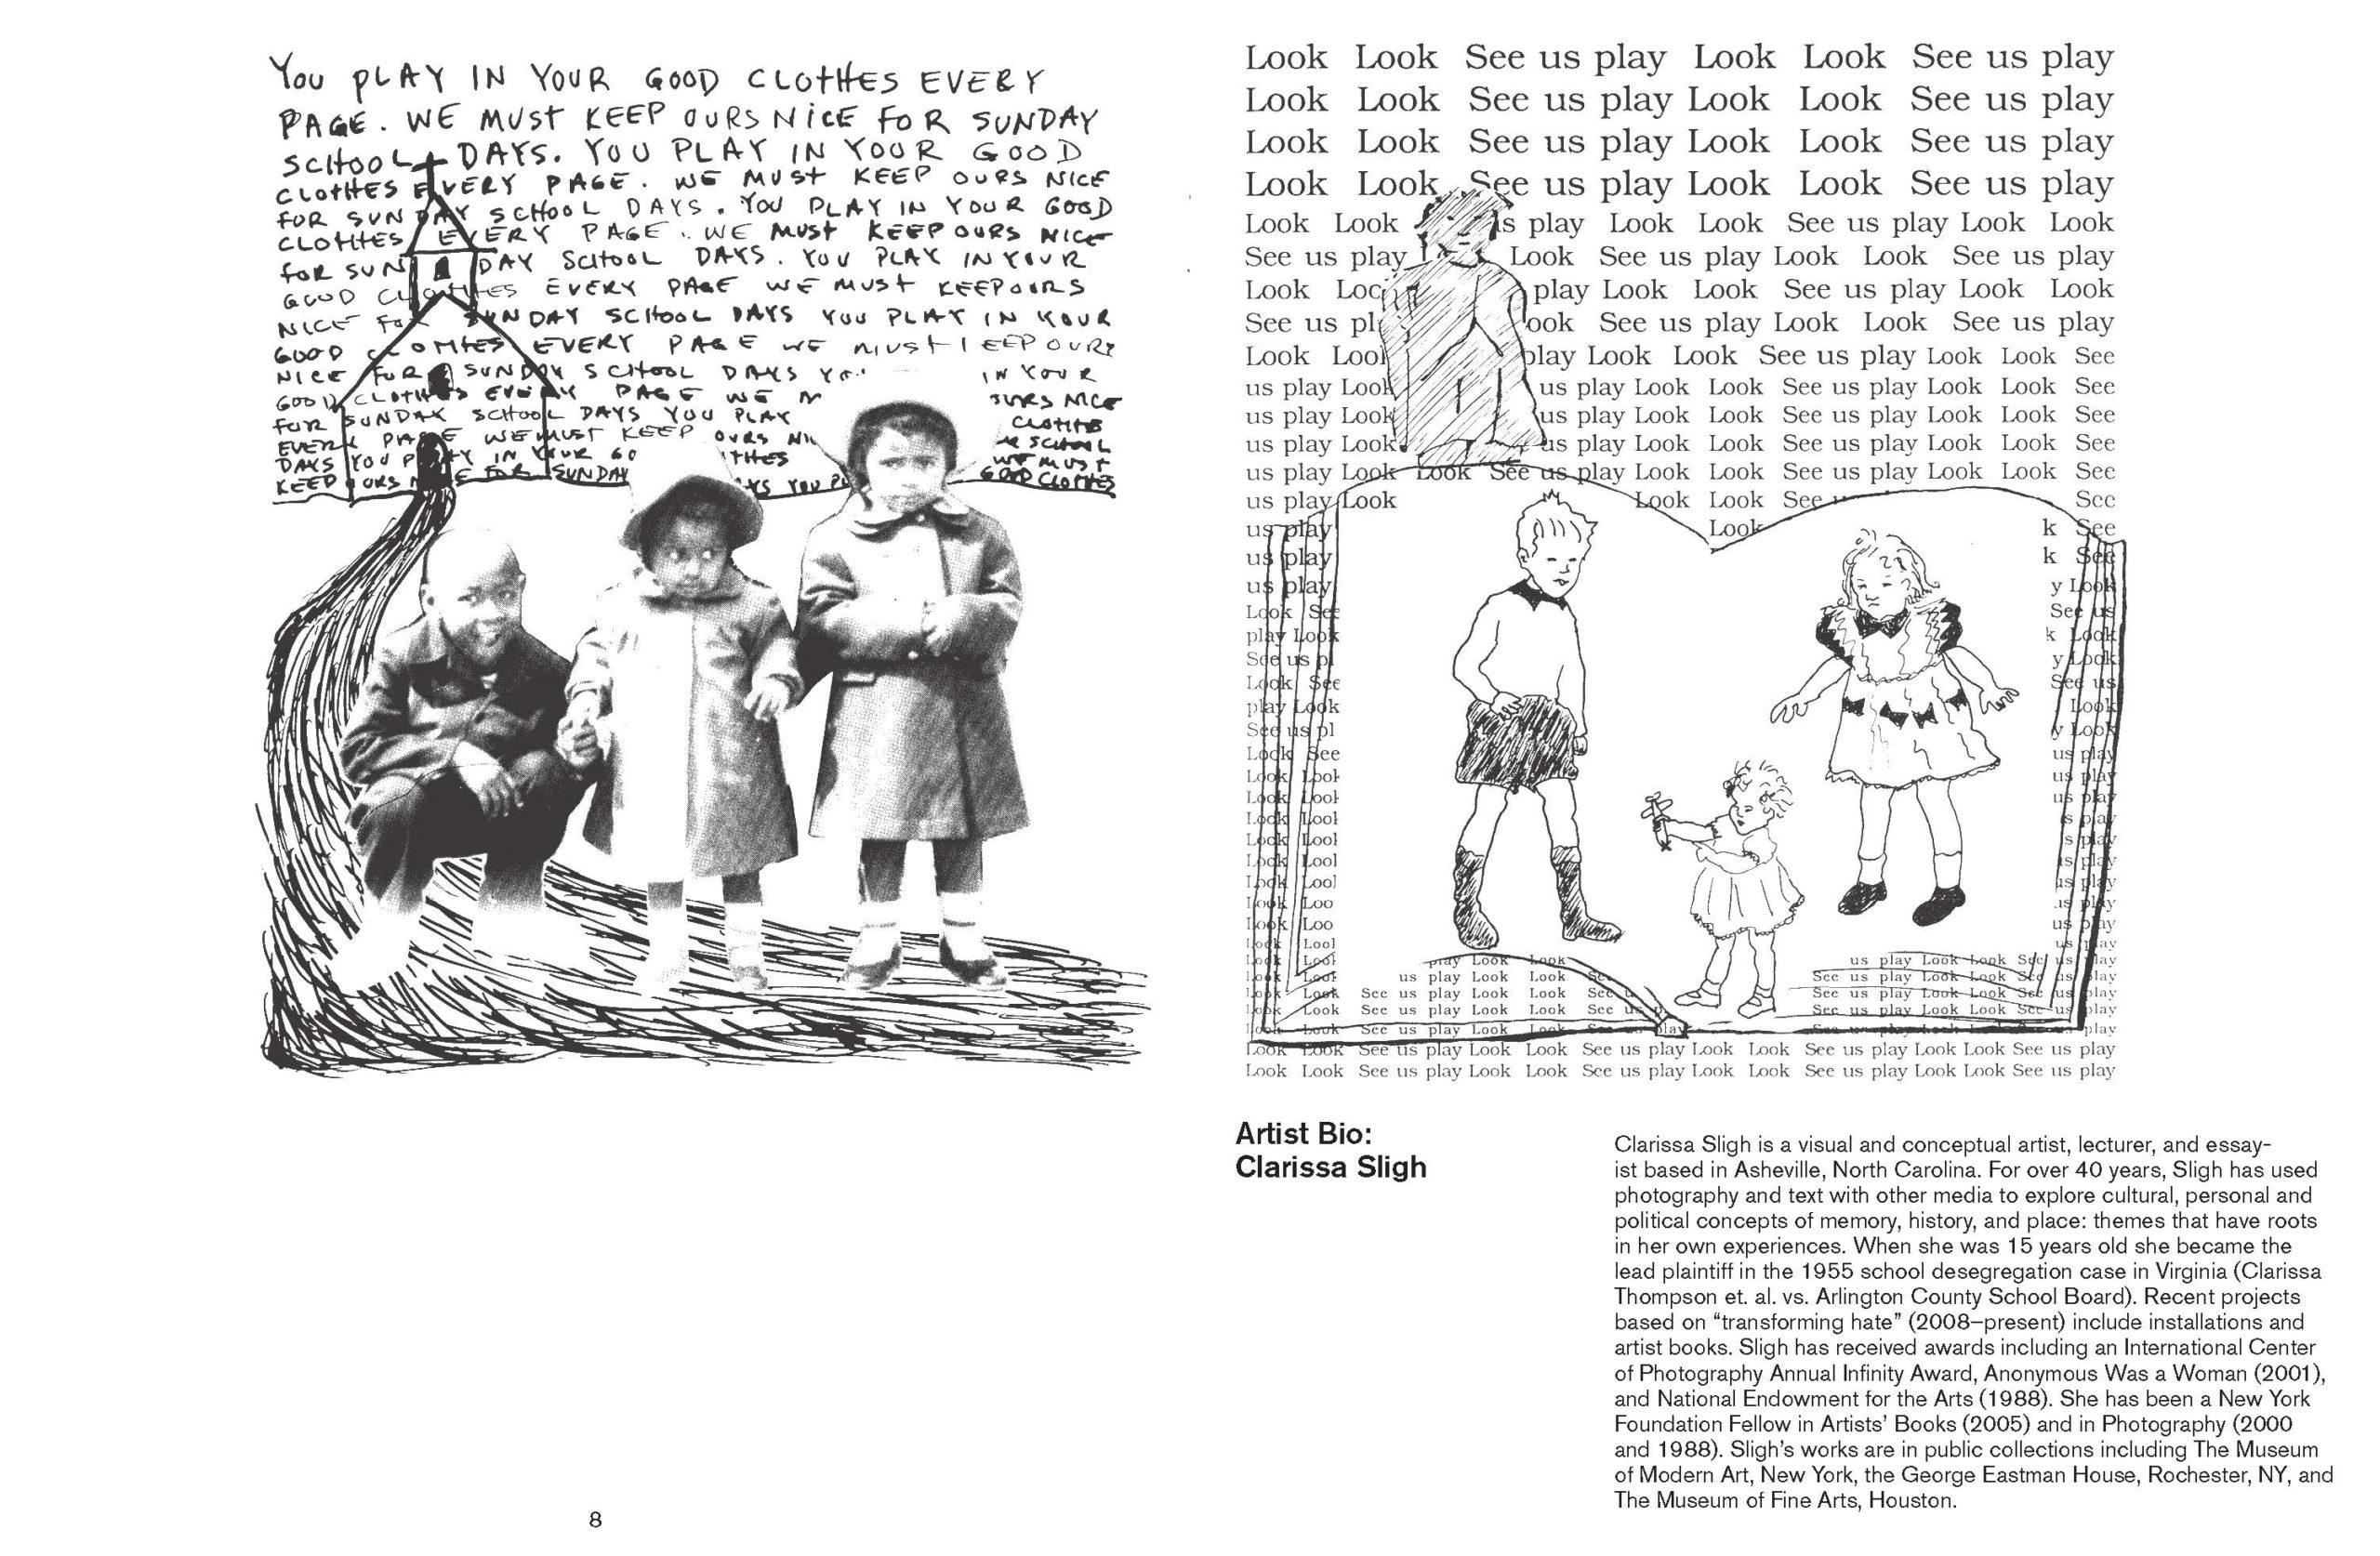 page 10 & 11 of Witnessing Through Artist's Books: Clarissa Sligh brochure